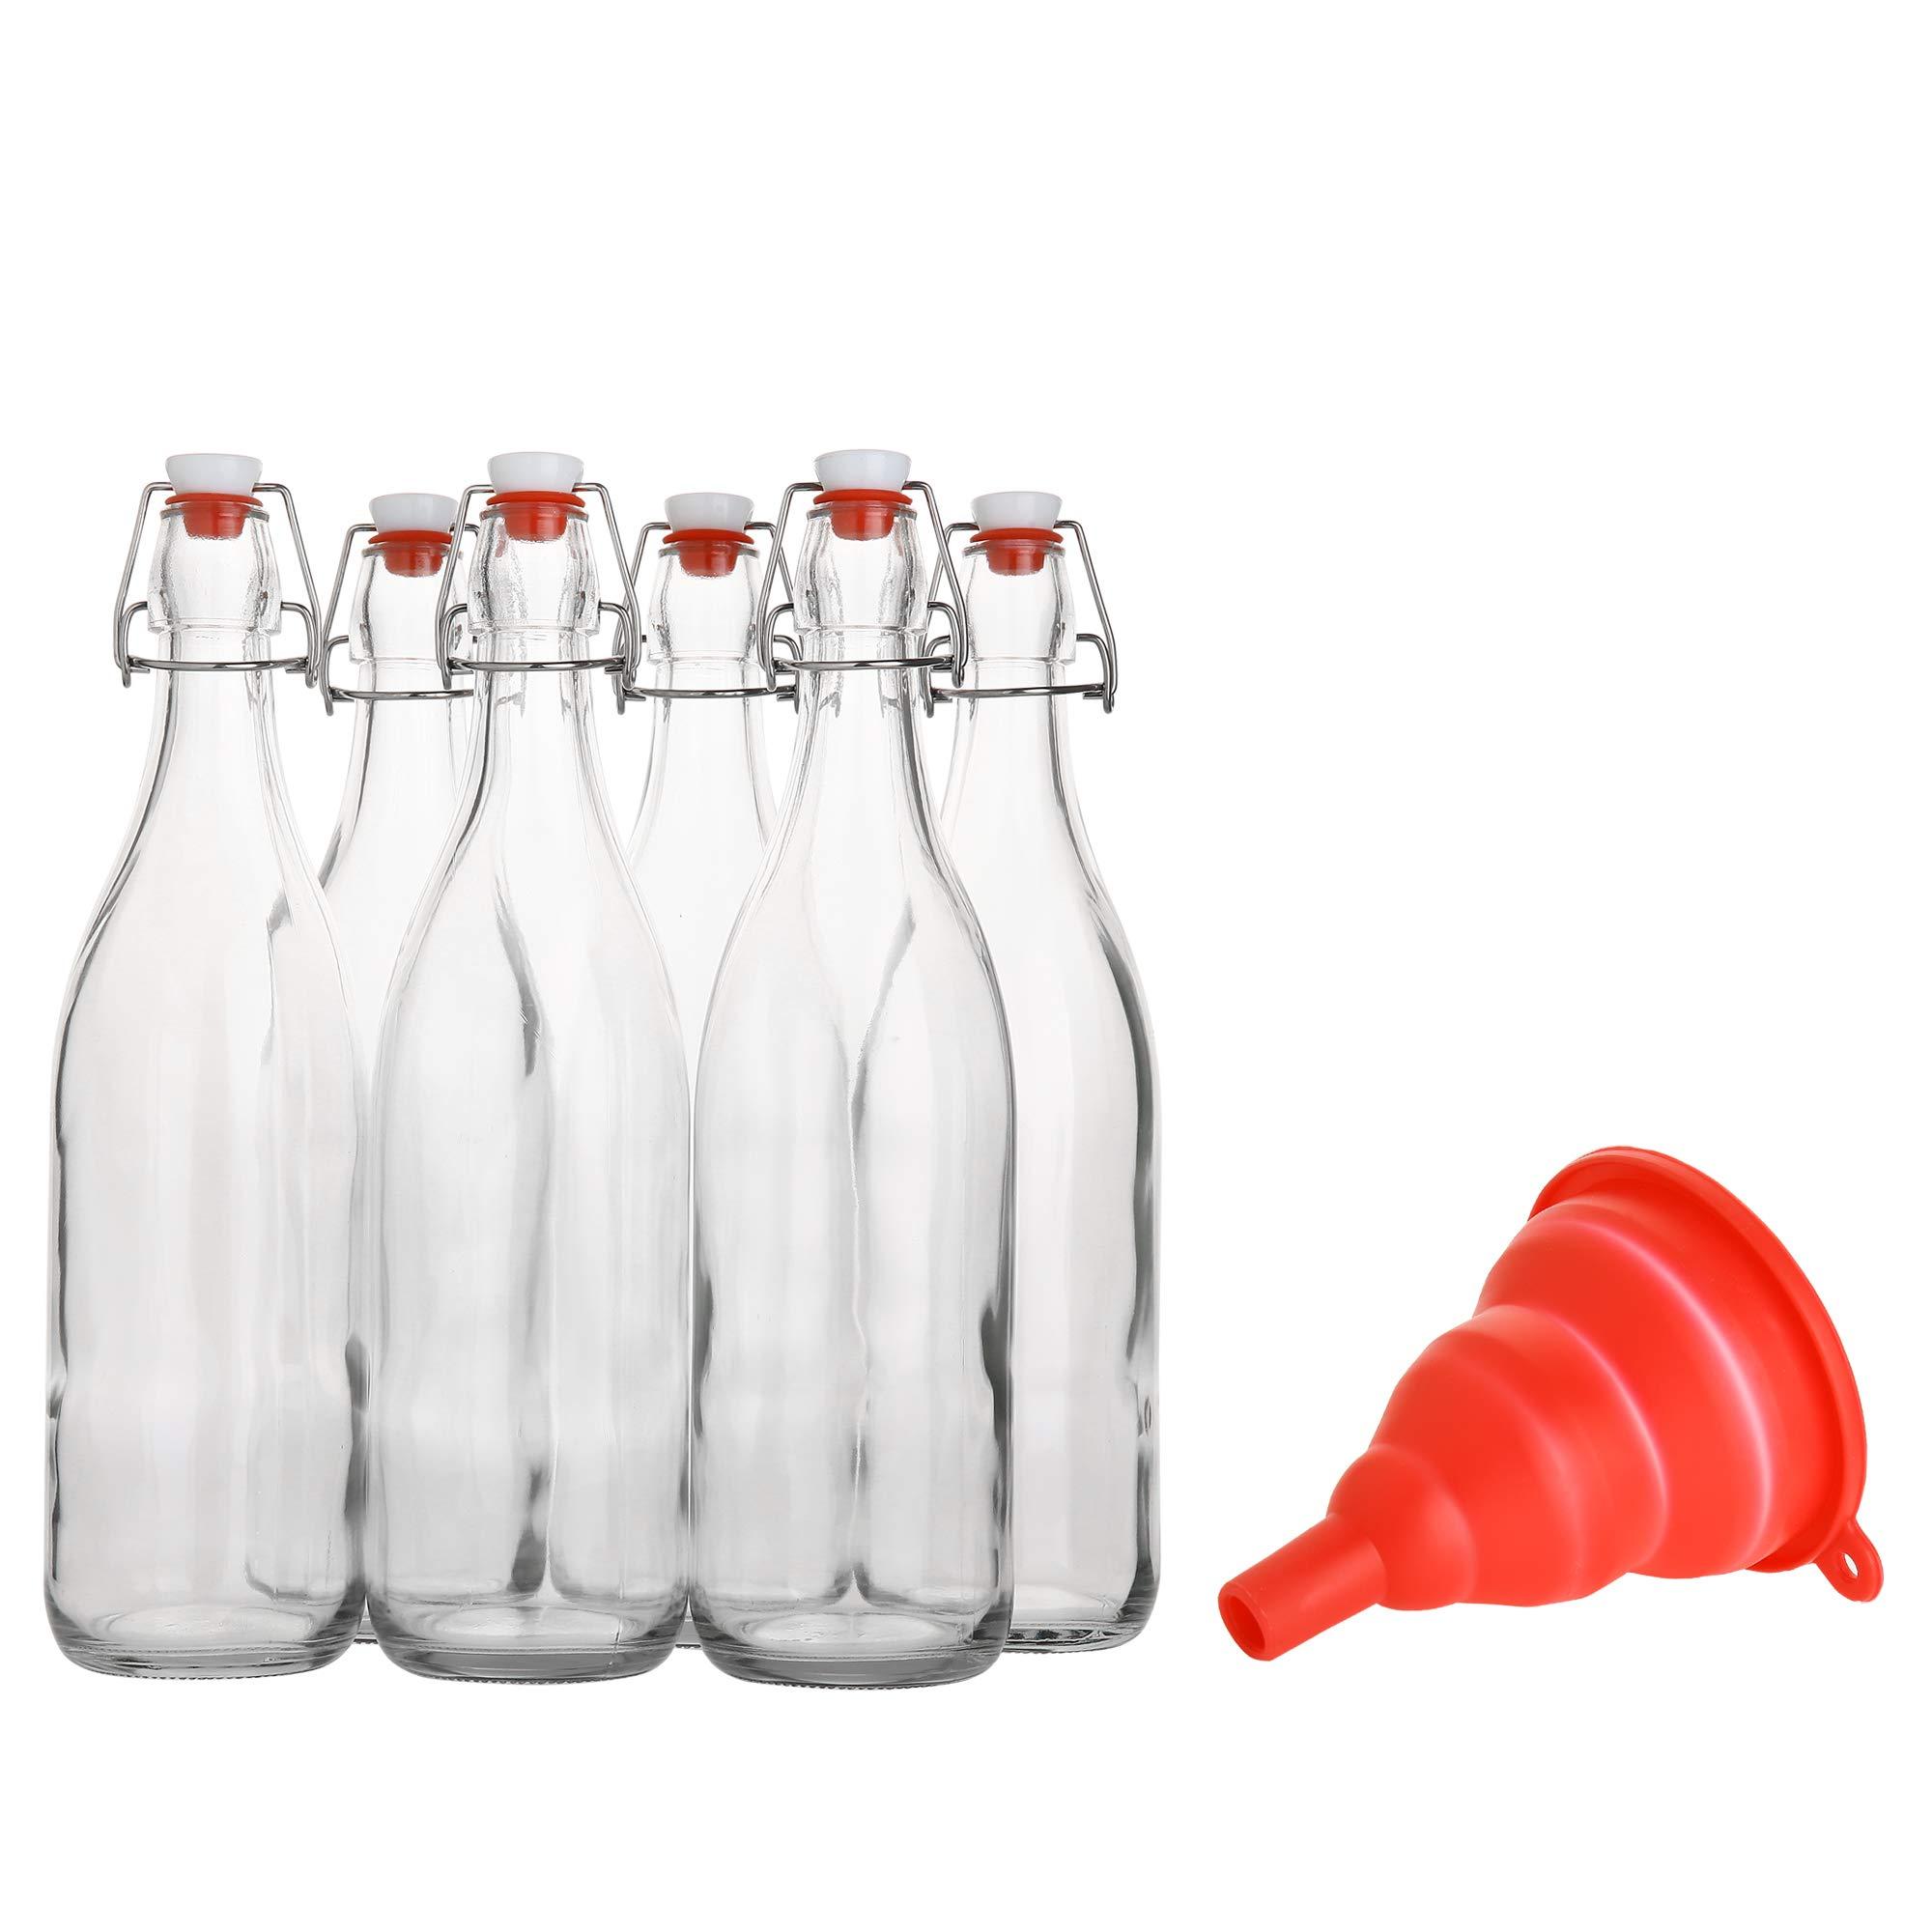 Flip Top Glass Bottle [1 Liter / 33 fl. oz.] [Pack of 6] - Swing Top Brewing Bottle with Stopper for Beverages, Oil, Vinegar, Kombucha, Beer, Water, Soda, Kefir - Airtight Lid & Leak Proof Cap - Clear by AYL